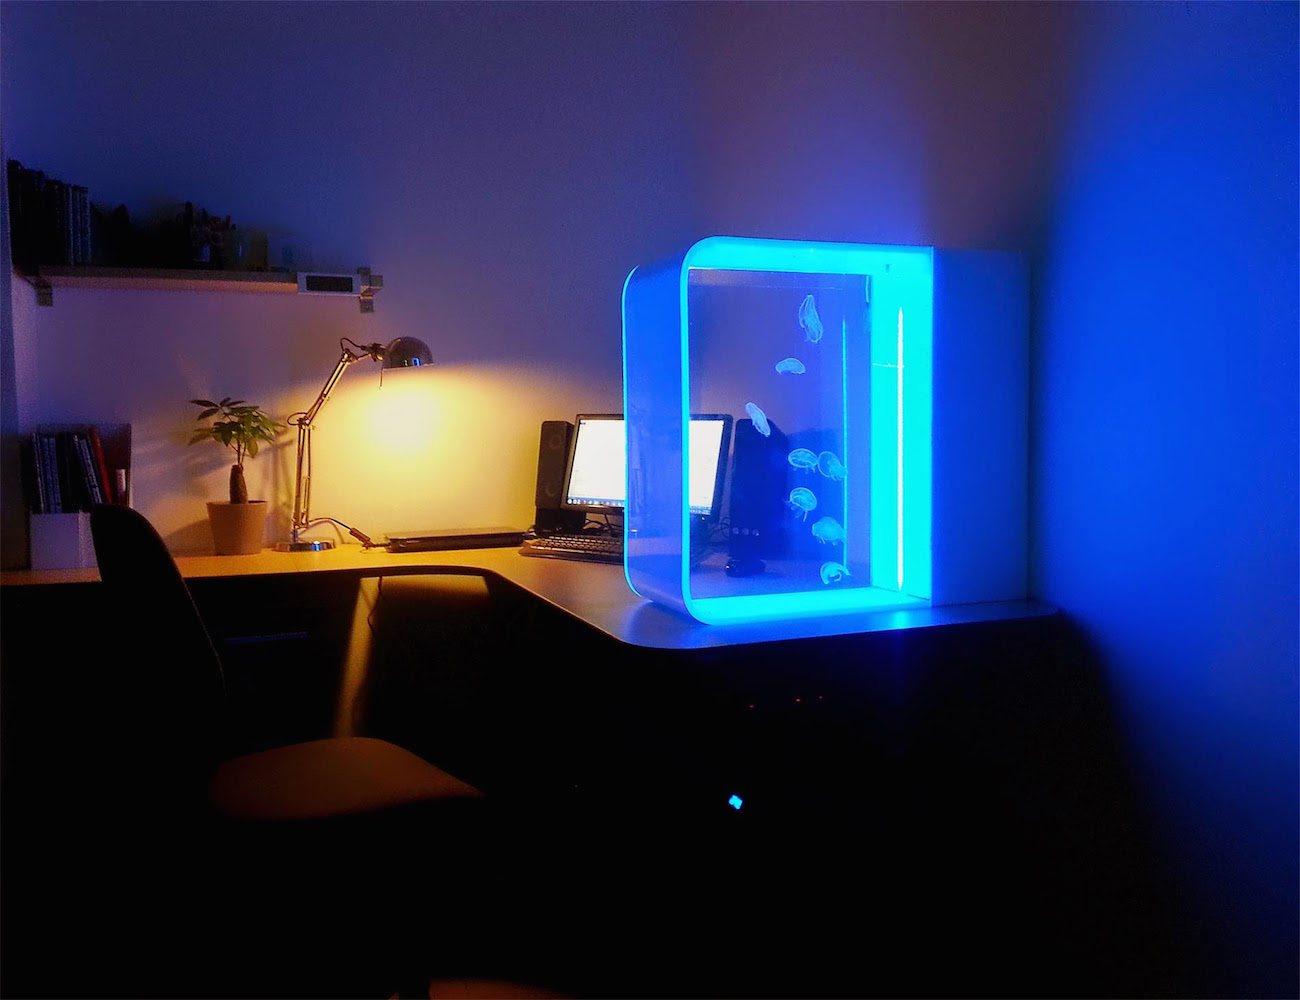 aquarium méduse fluorescente, lumière fluorescente méduse,